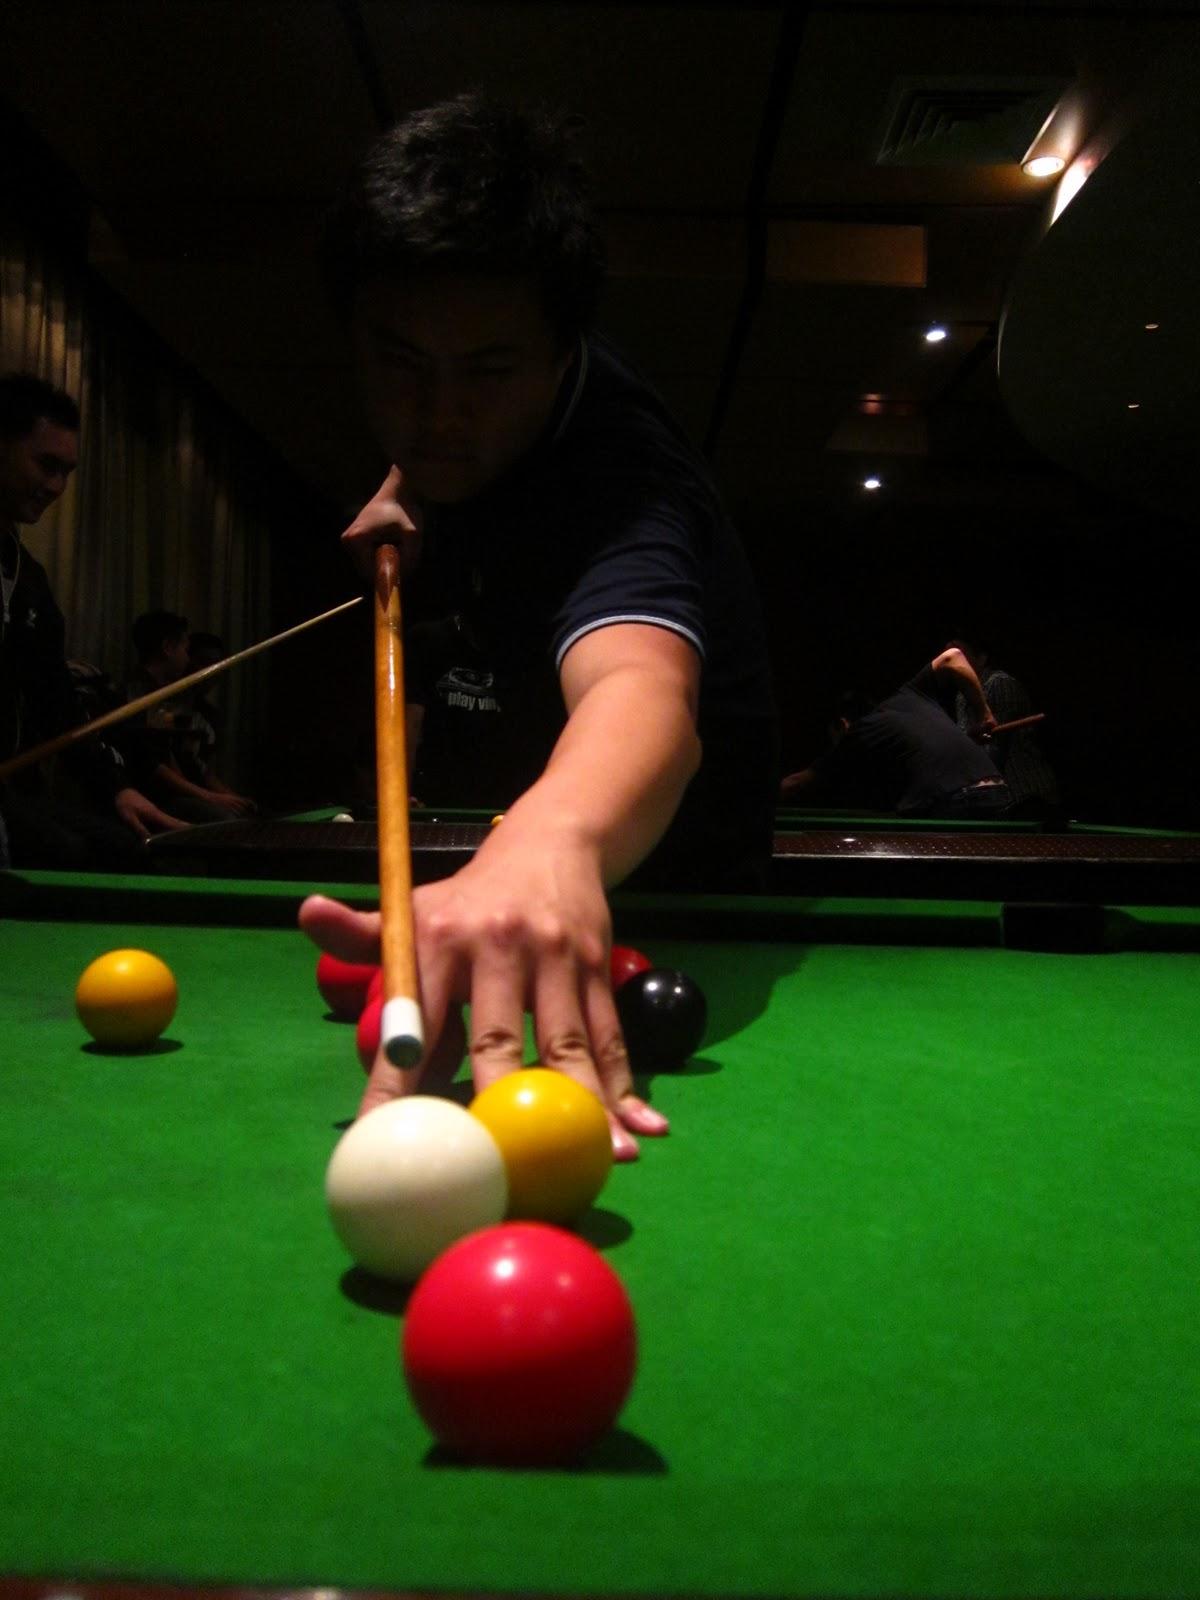 Dennis Orcollo Carlo Biado 240p Star Billiards Money Game 2011 No Sound